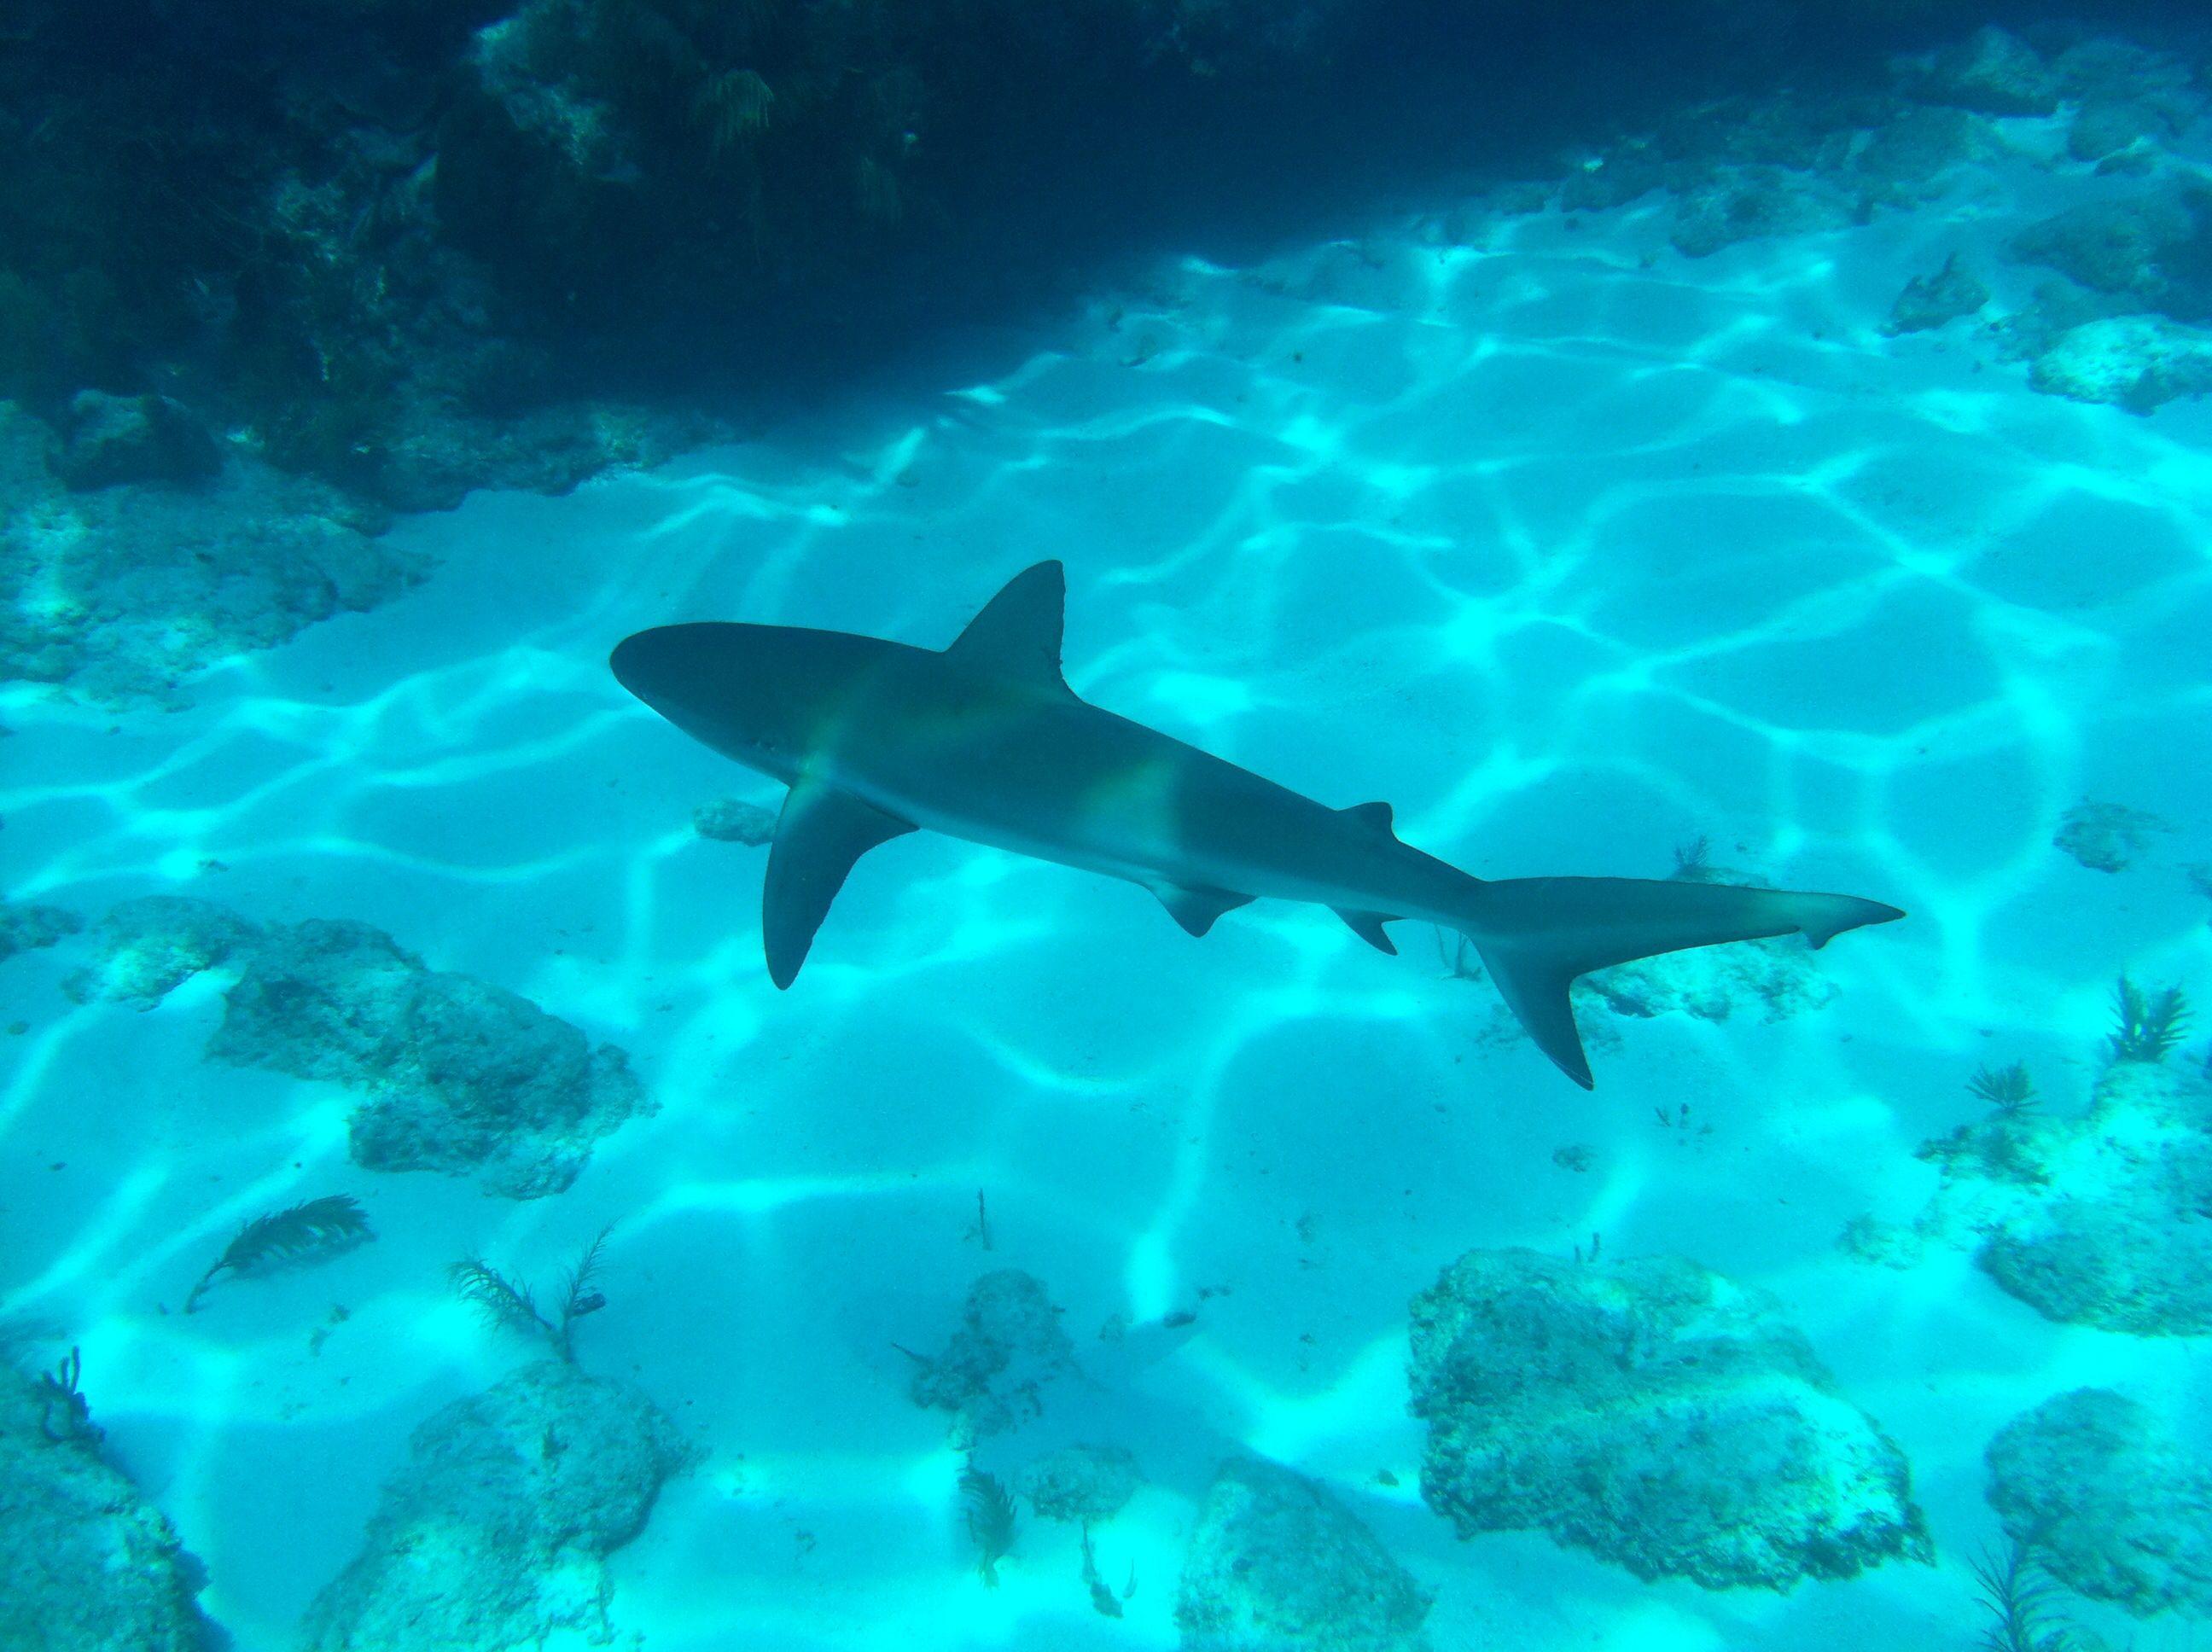 Pin By Loren Elizabeth On Scuba Vacations Shark Florida Keys Adventure